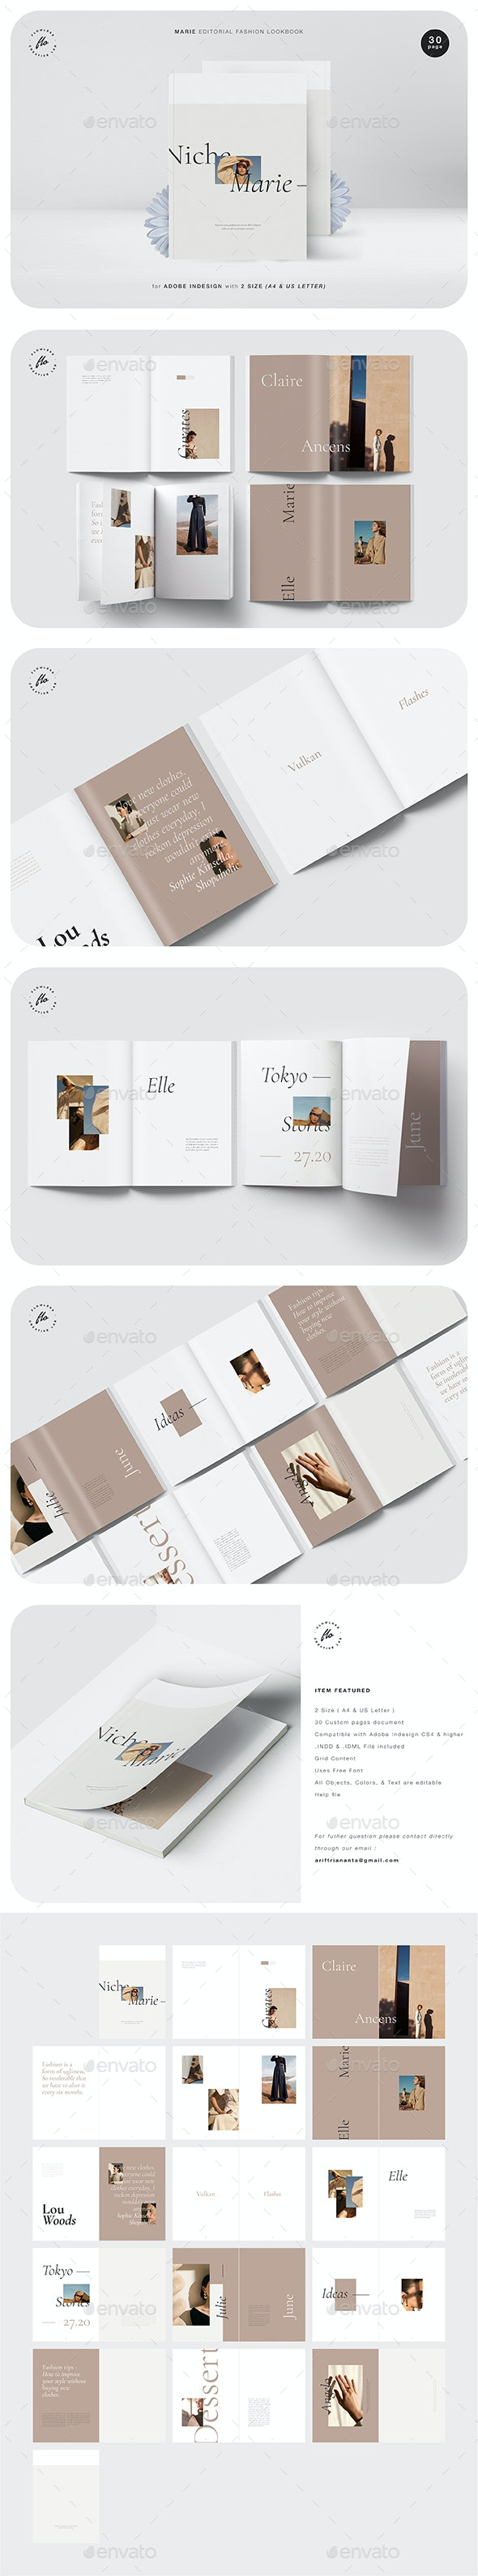 Marie Editorial Fashion Lookbook - Magazines Print Templates